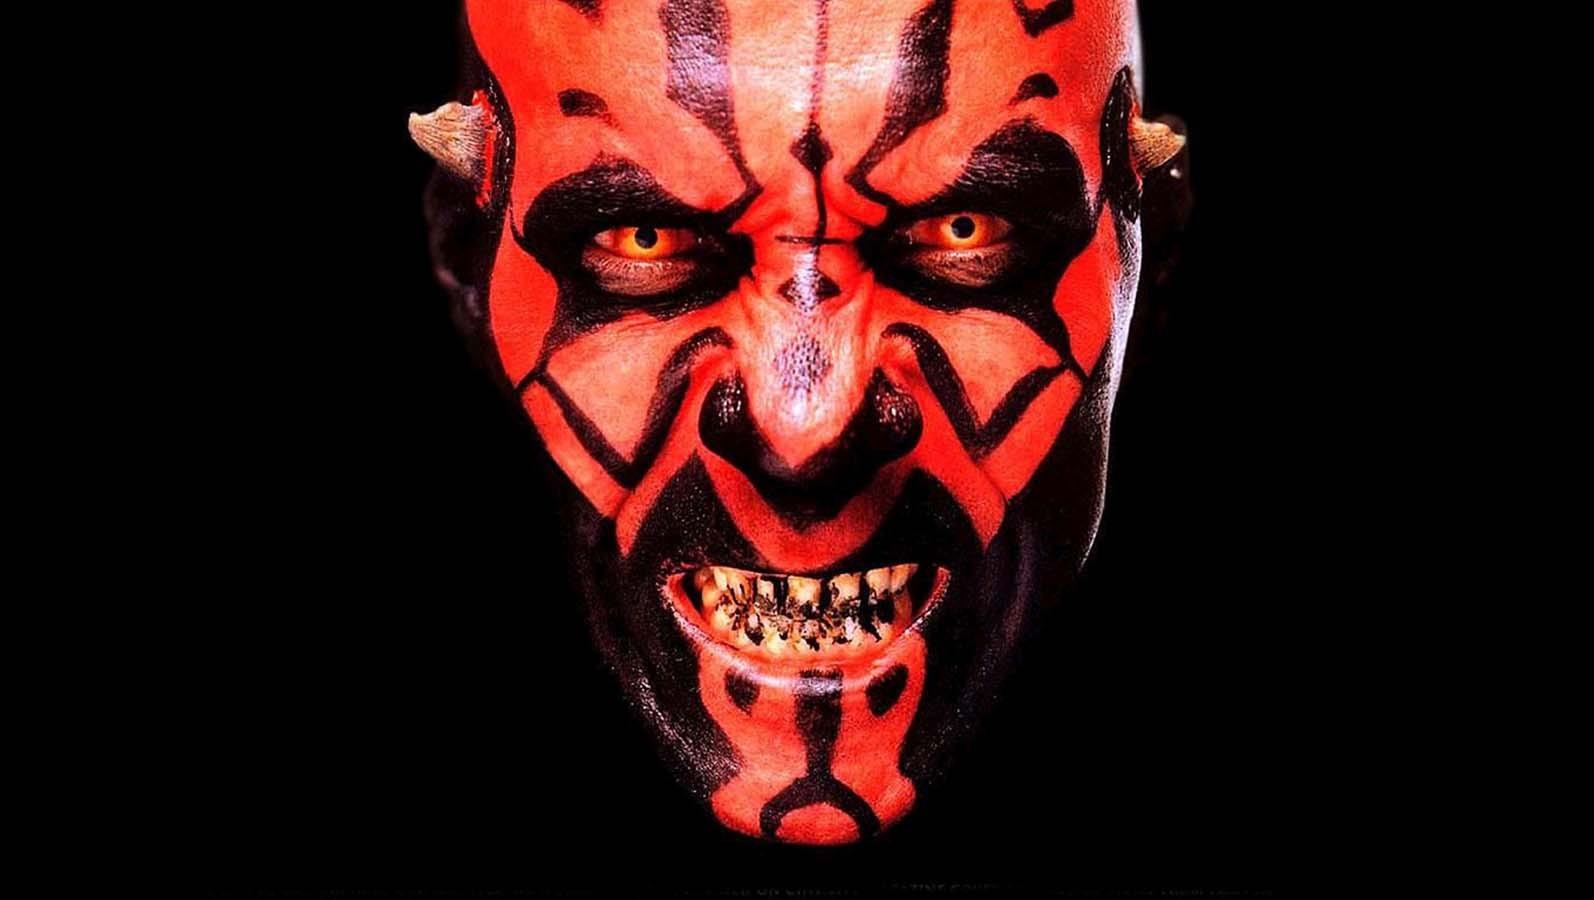 General 1594x900 Darth Maul Star Wars red eyes Sith Star Wars Villains